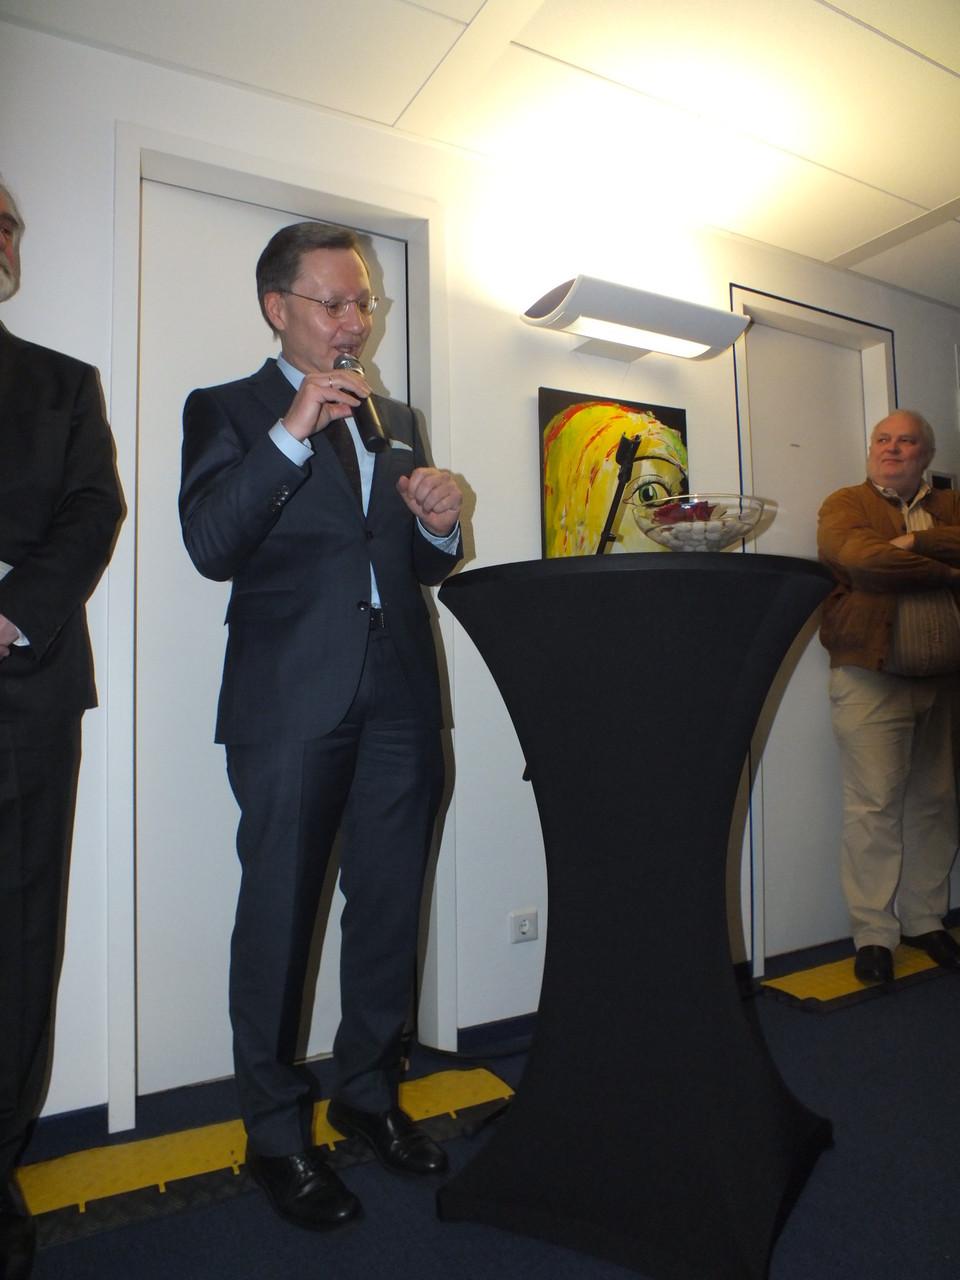 Robert Restani, Vorstandsvorsitzender der Frankfurter Sparkasse